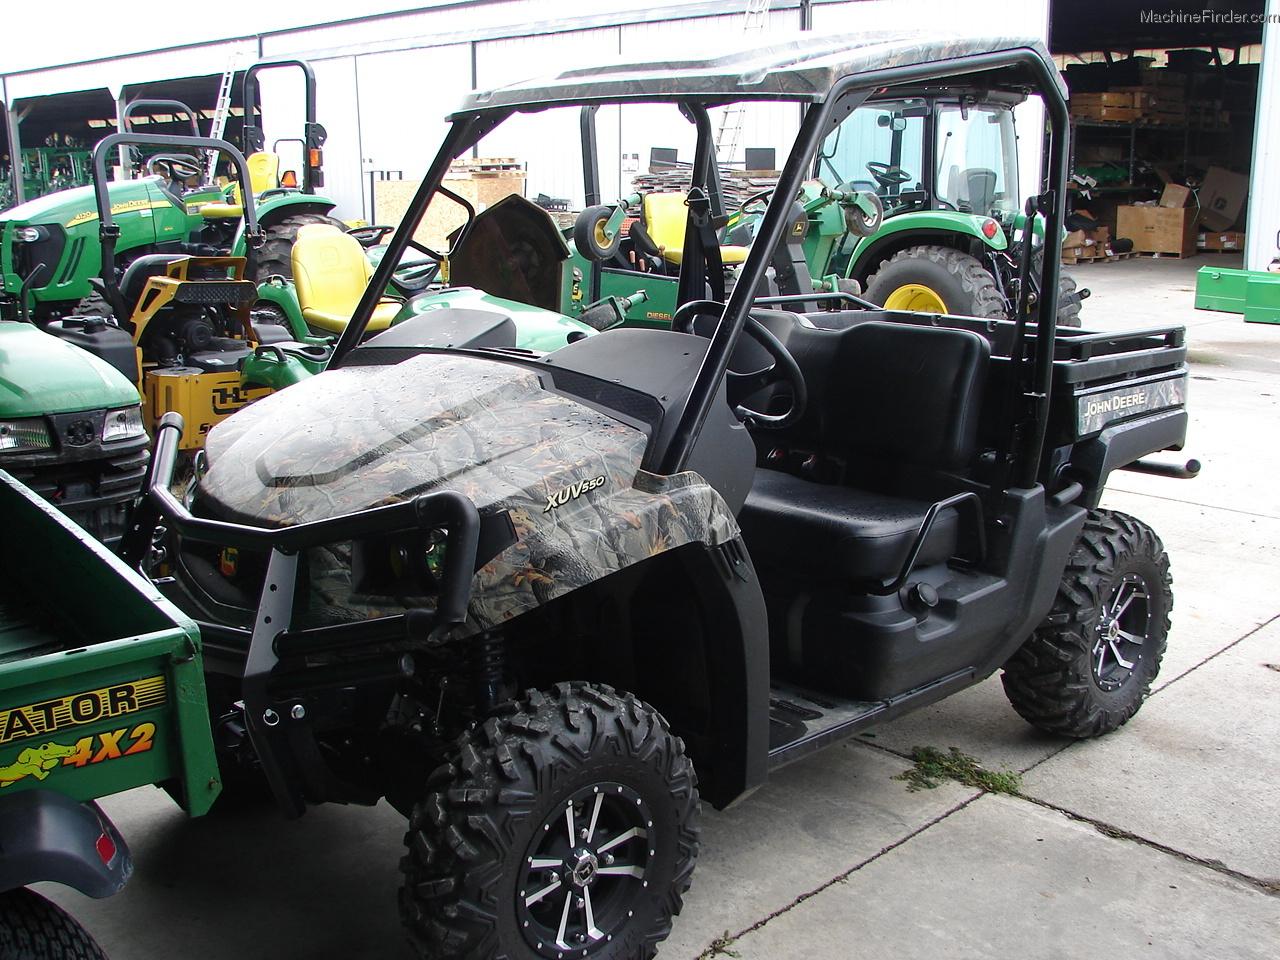 John+Deere+XUV+550+Camo 2013 John Deere XUV 550 CAMO ATV's and Gators ...